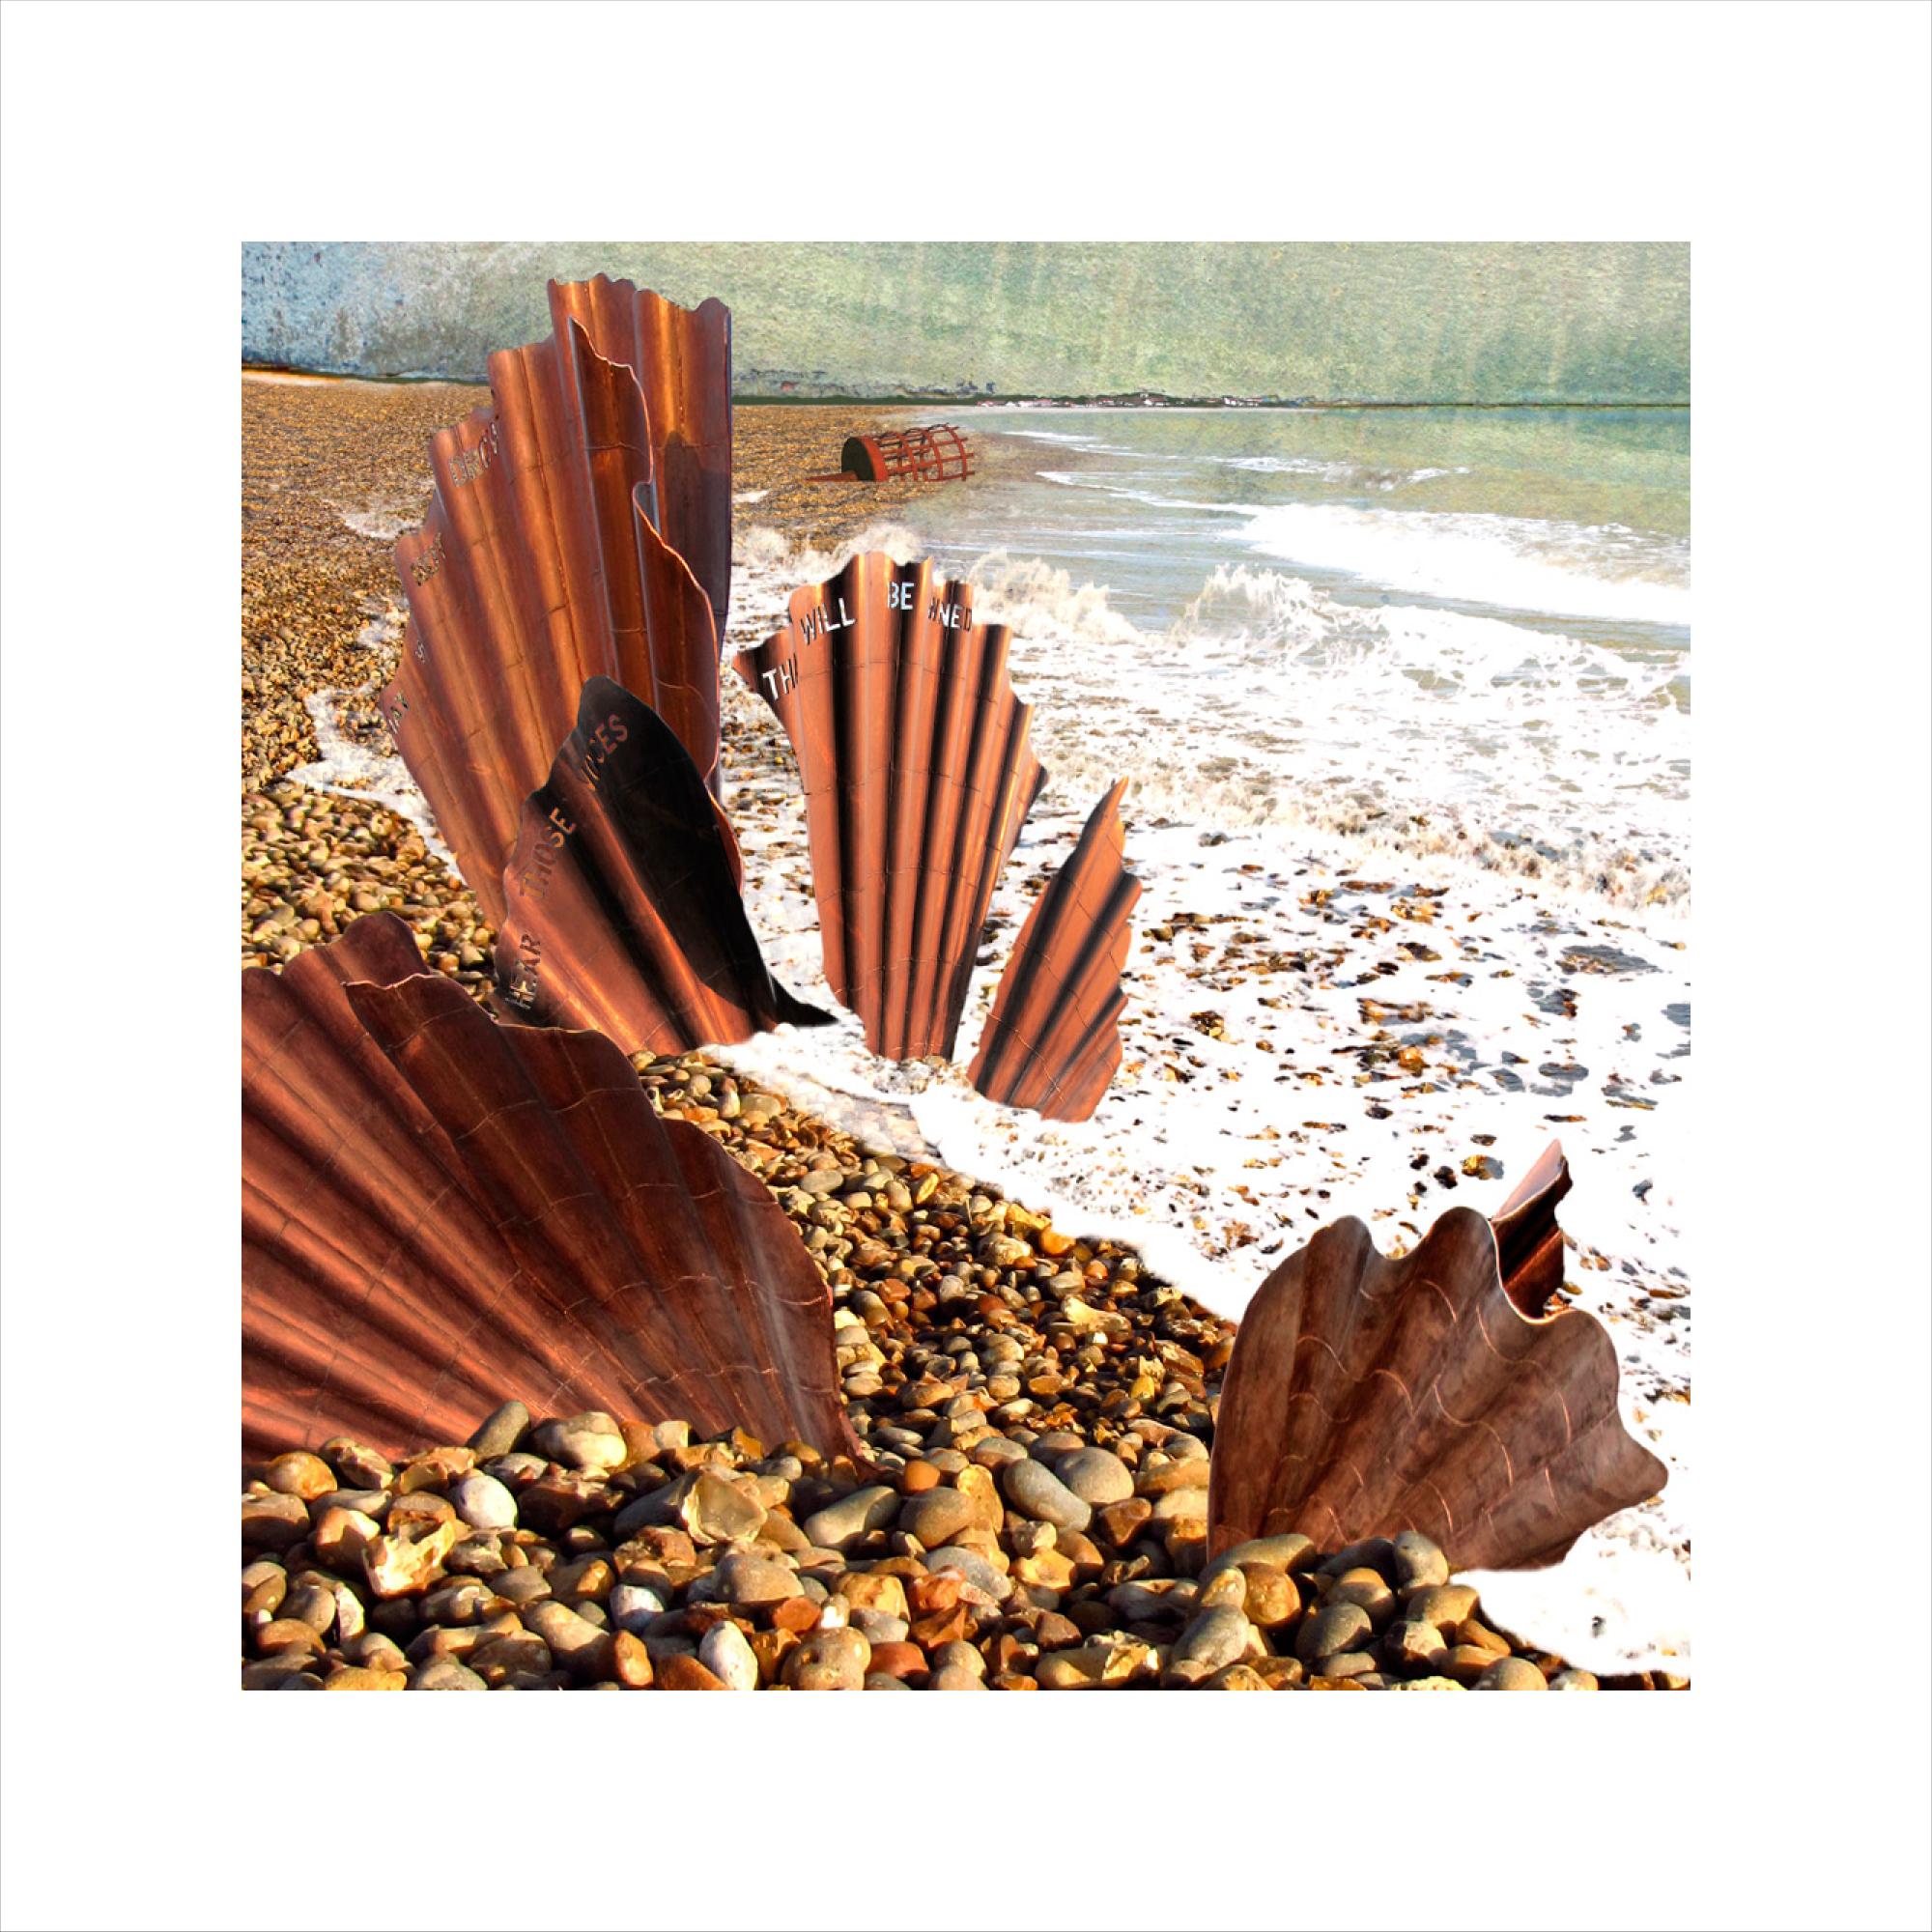 Claire Gill, digital photomontage, Limited edition print, Fine art print, collect art, seascape 27, coastal art, Aldeburgh, Maggi Hambling